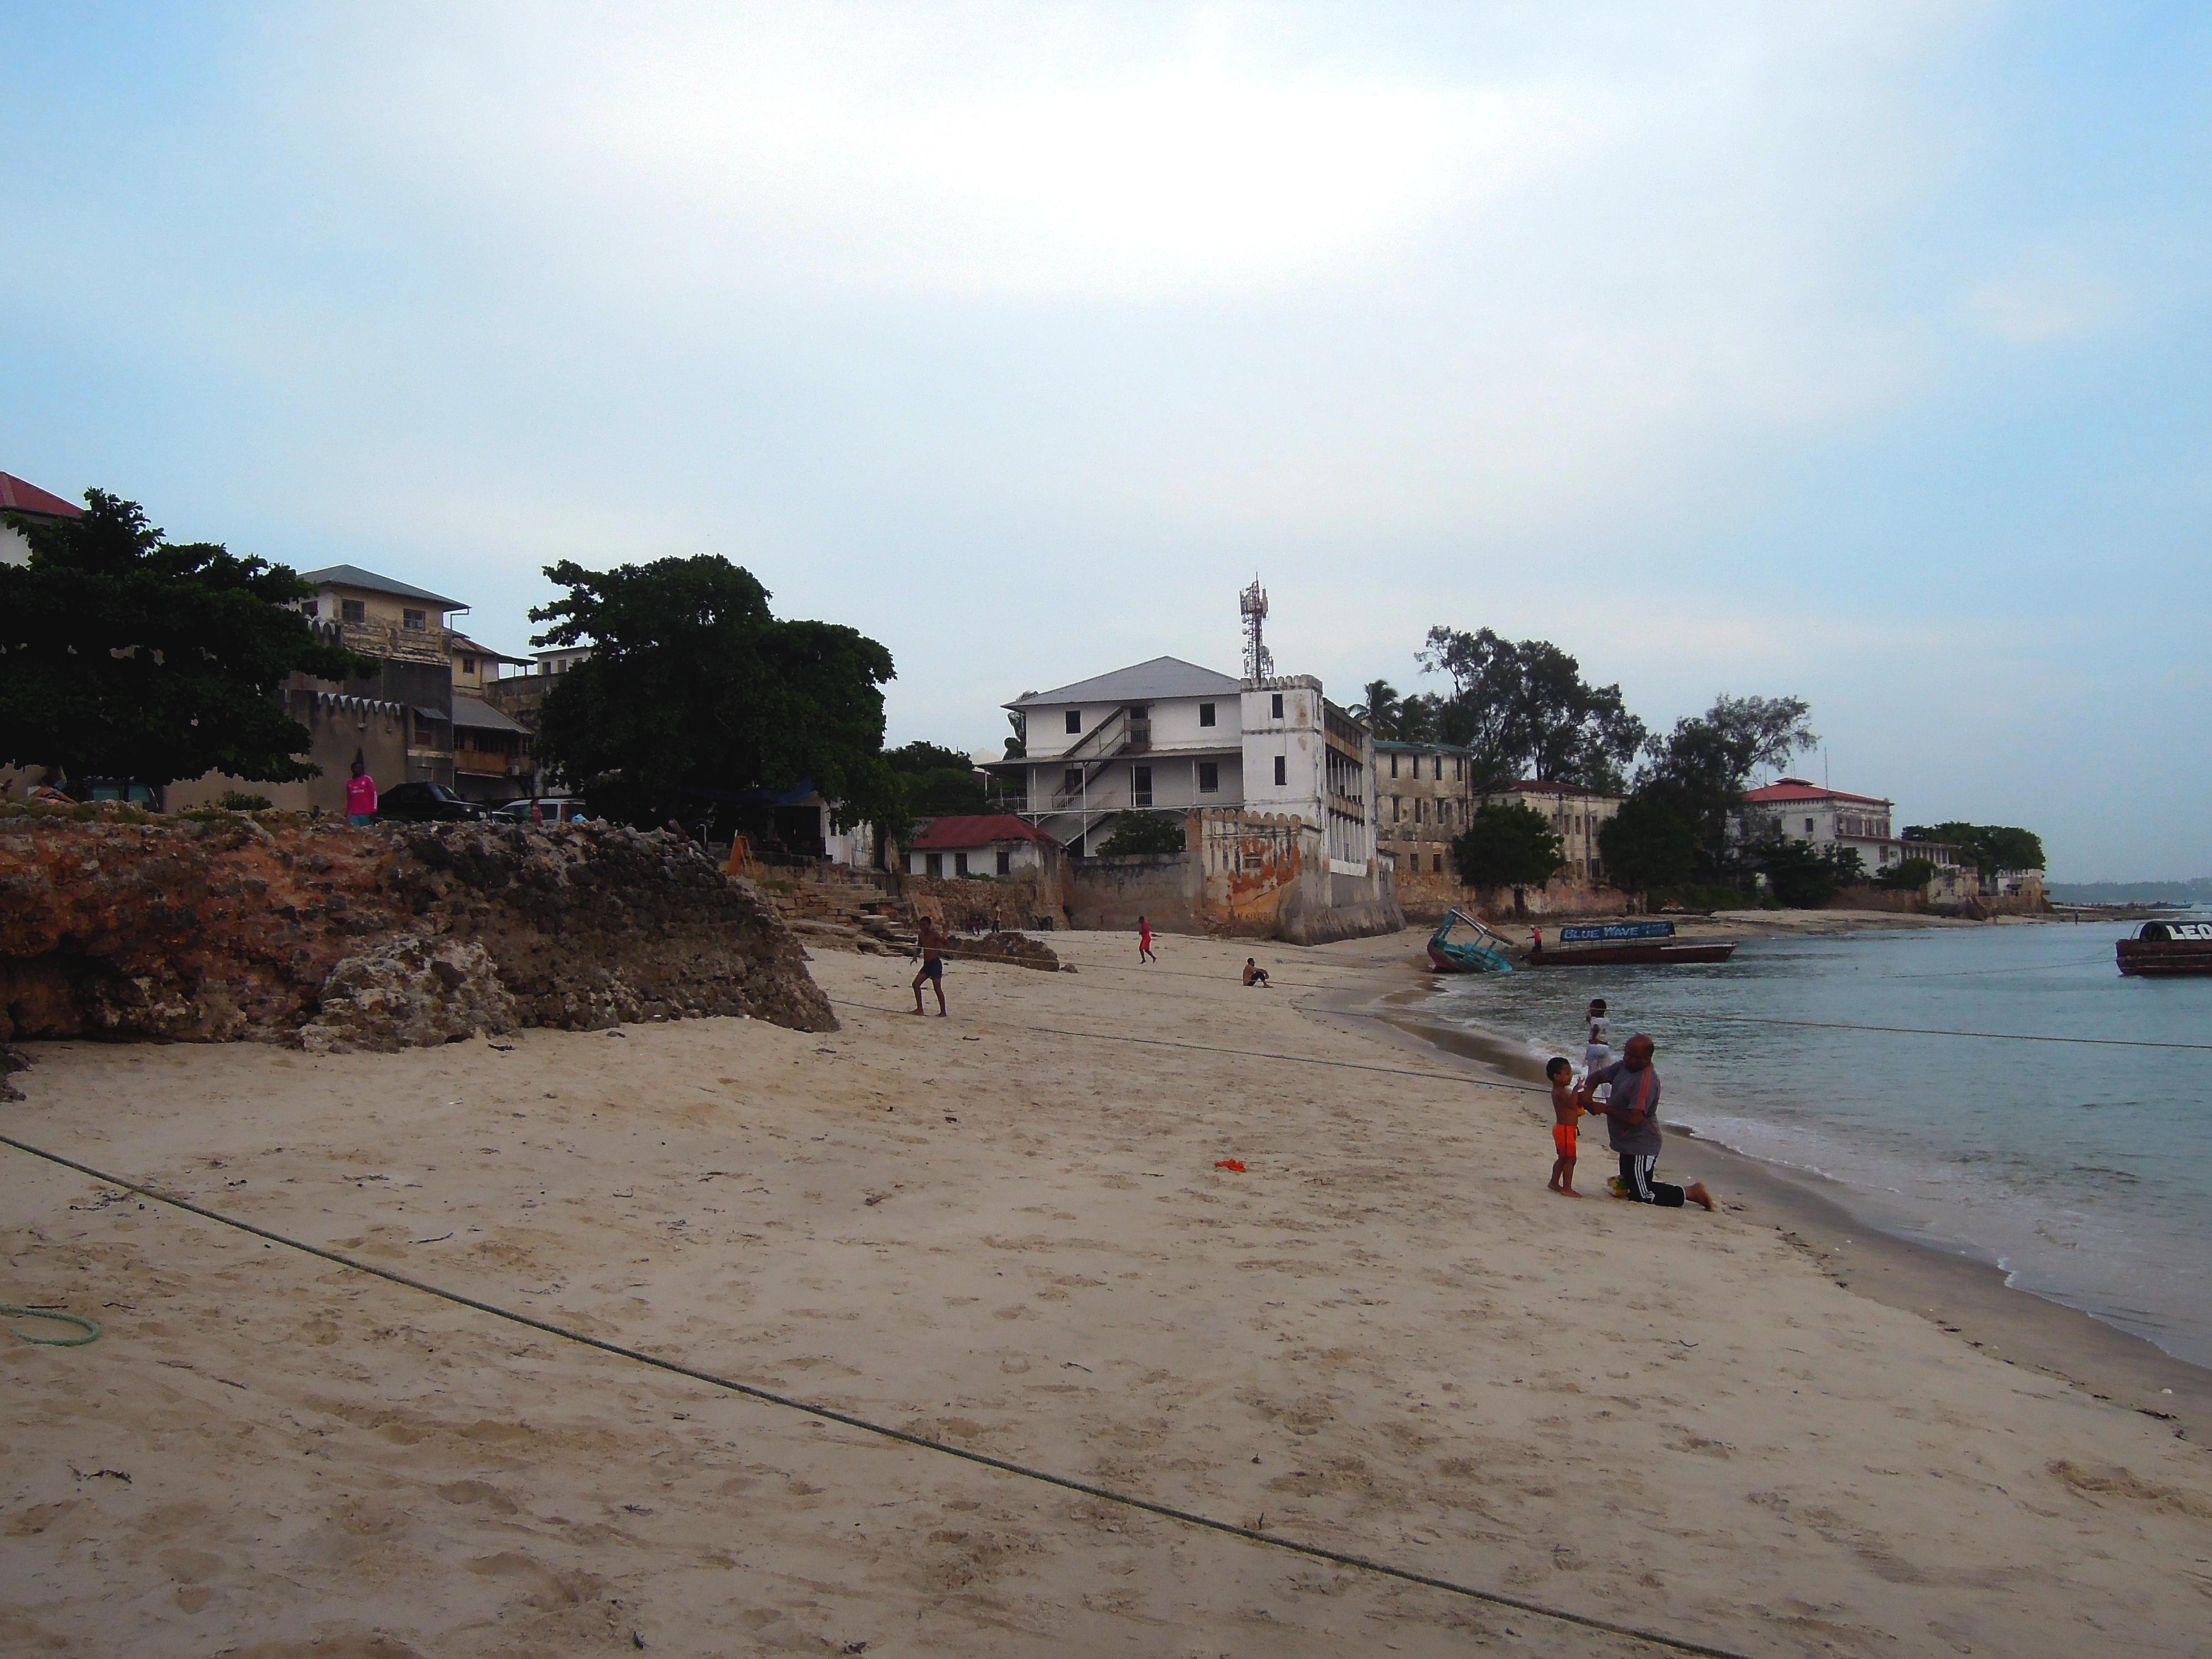 Nadbrzeżne wille, Stone Town, Zanzibar, Tanzania, fot. M. Lehrmann